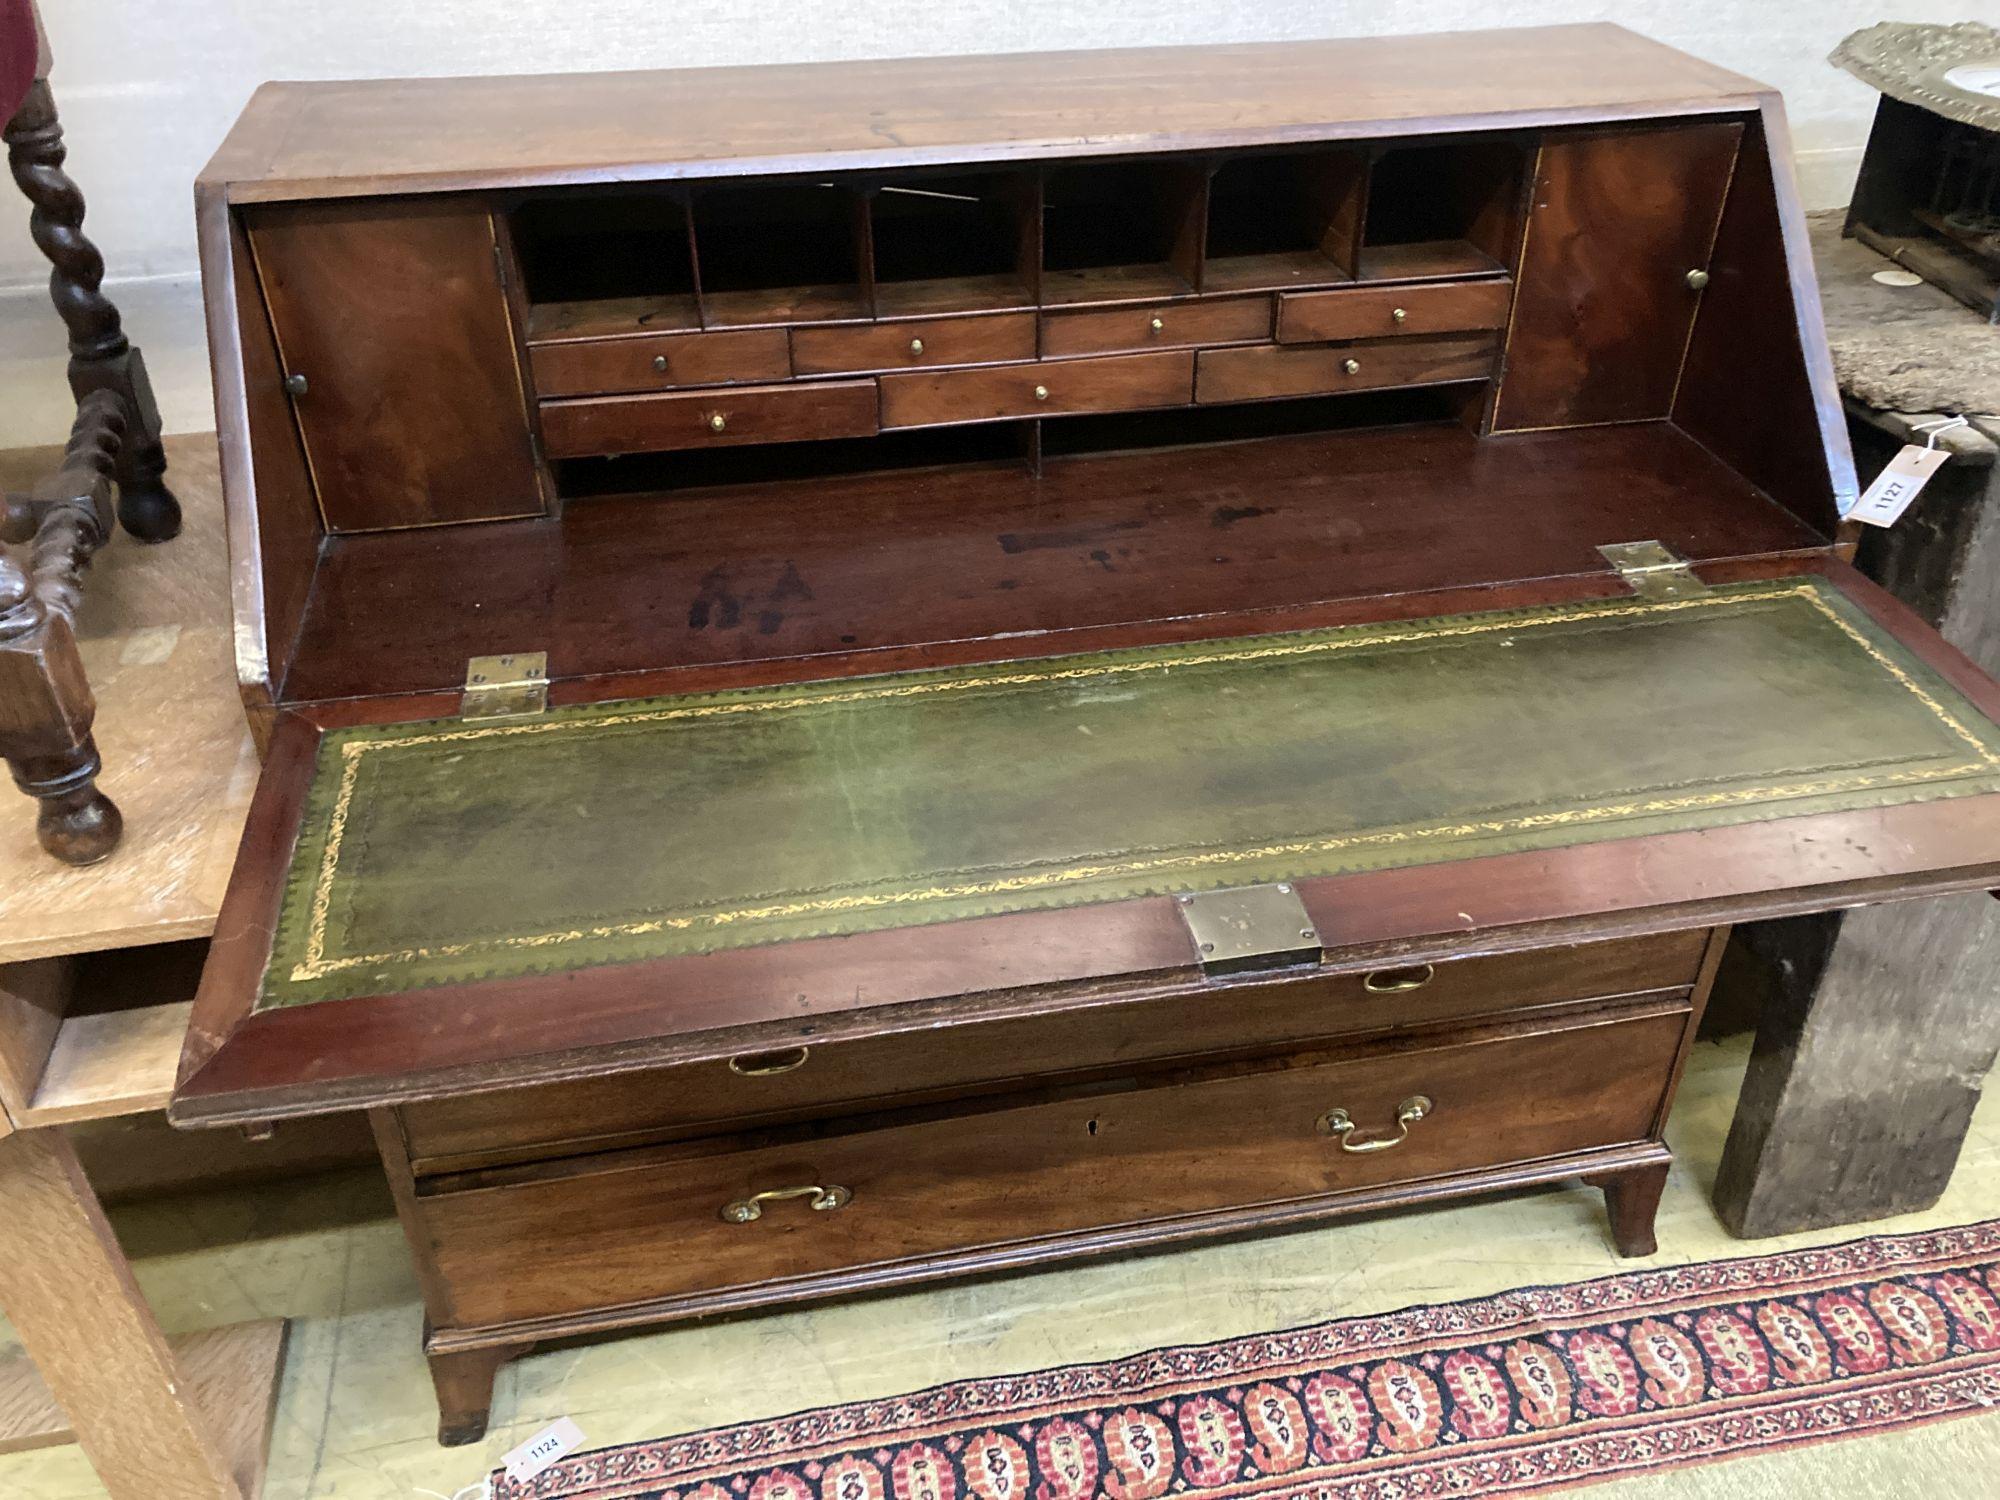 A George III mahogany bureau, width 117cm depth 51cm height 117cm - Image 2 of 3